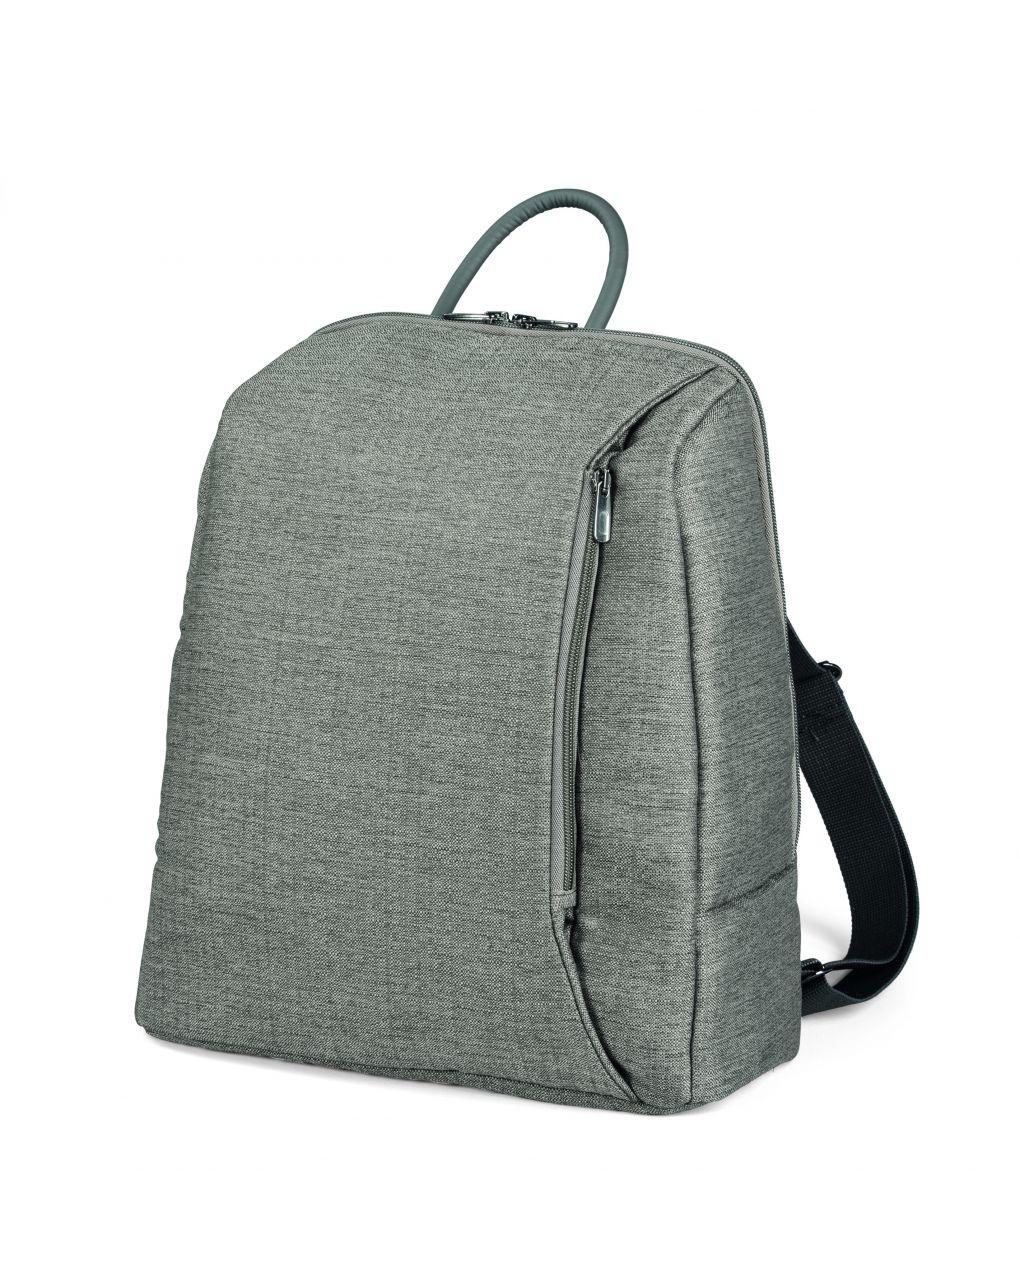 Backpack city grey - Peg-Pérego